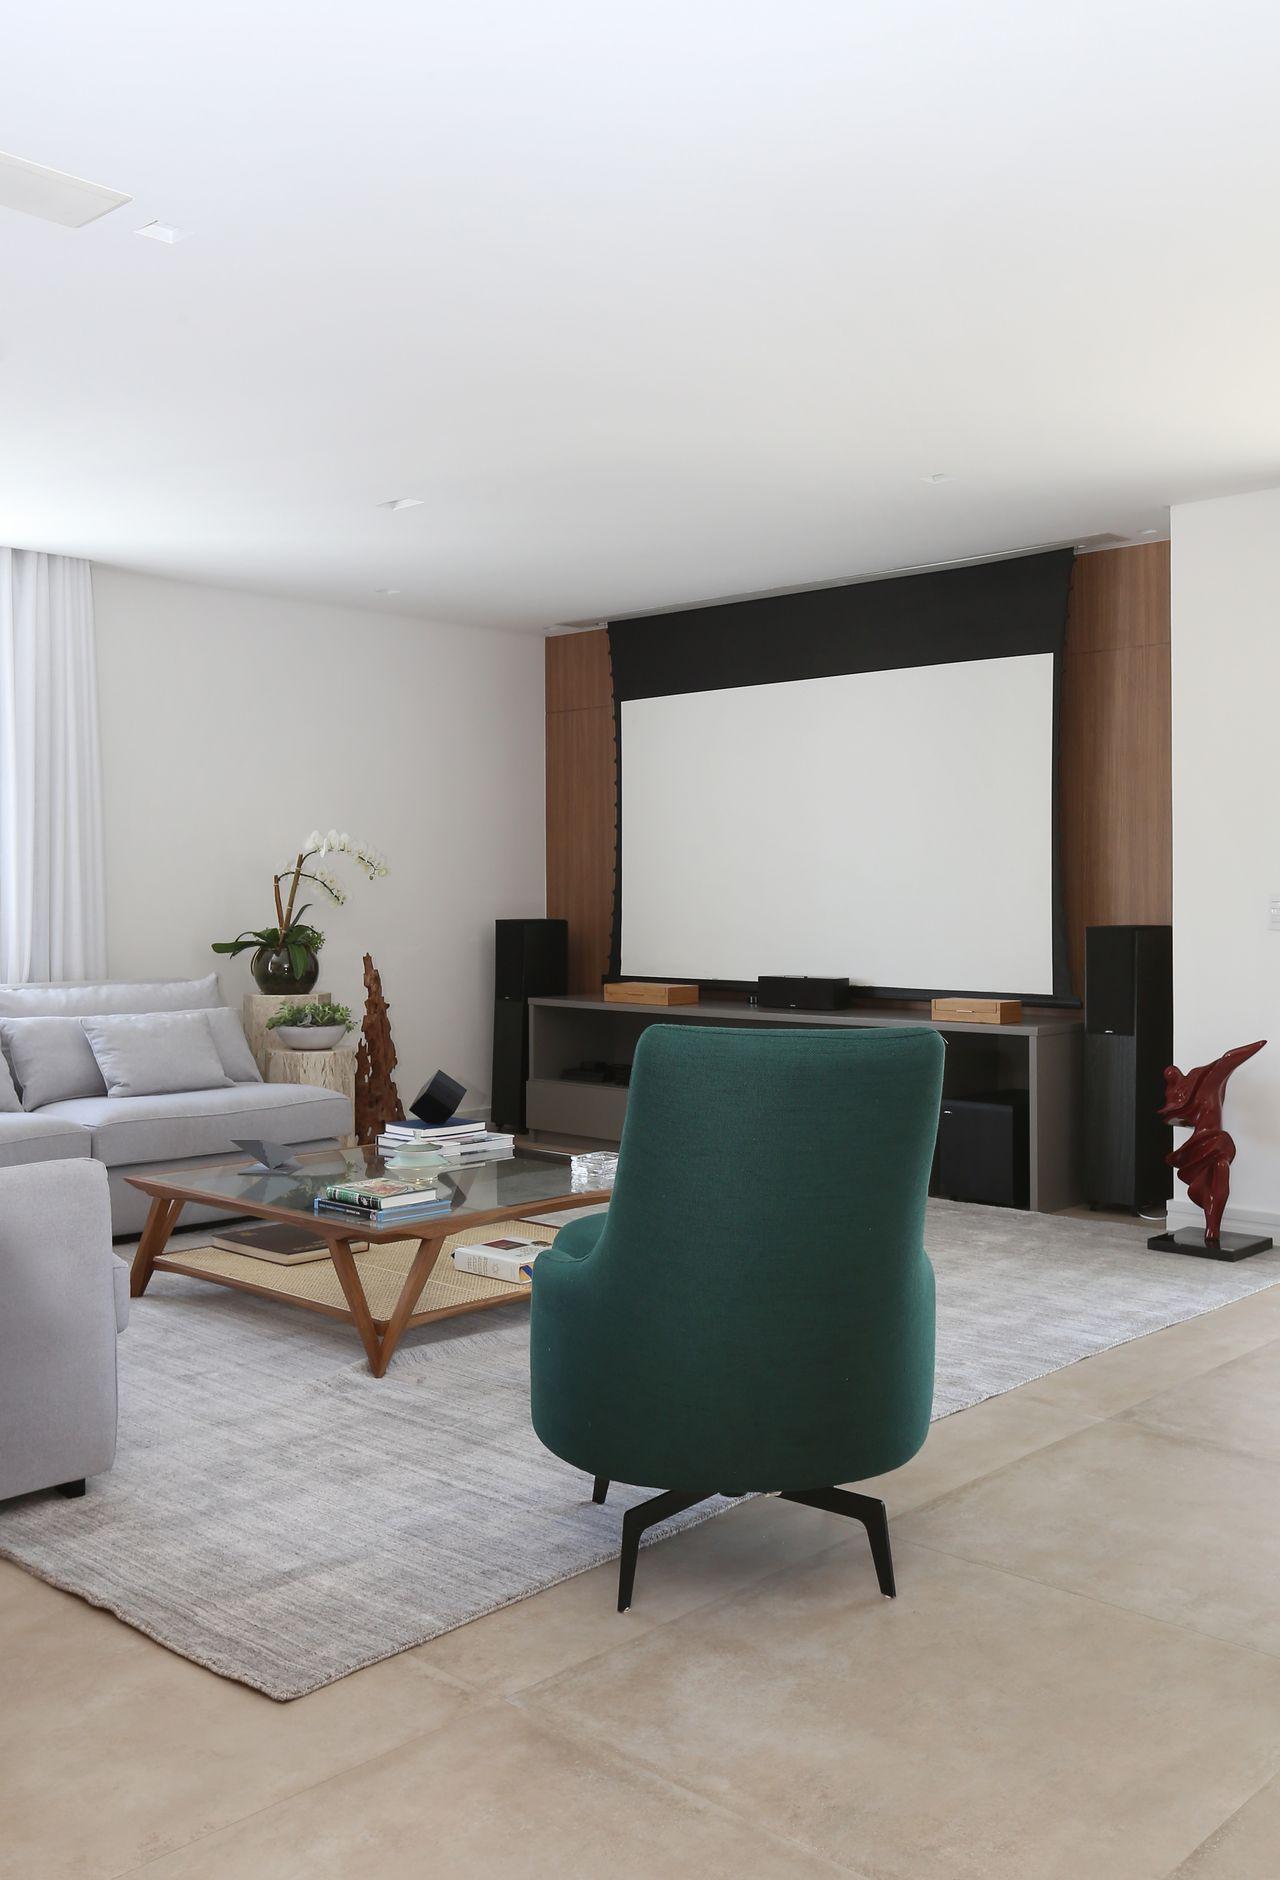 Poltrona Verde E Tapete Cinza De Start Arquitetura 166754 No Viva